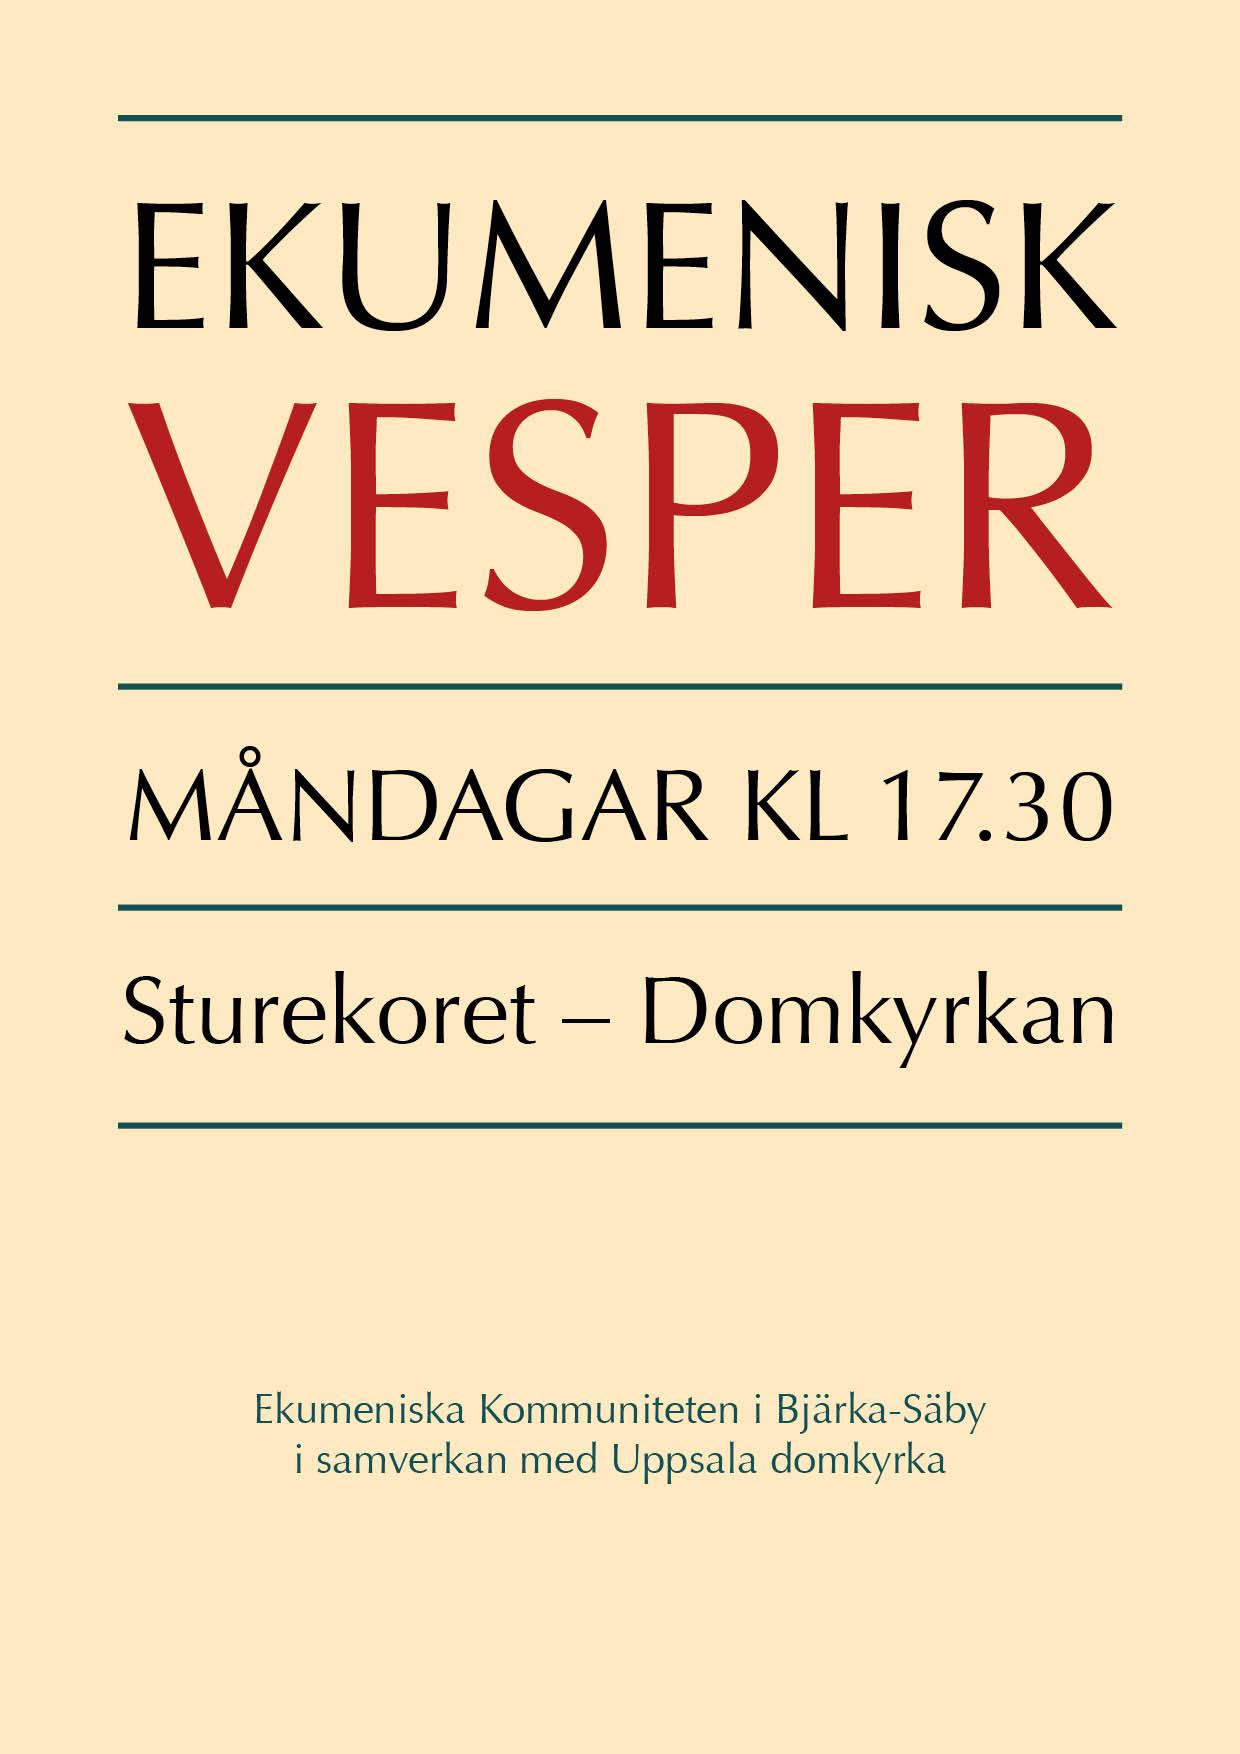 ekumenisk-vesper-uppsala